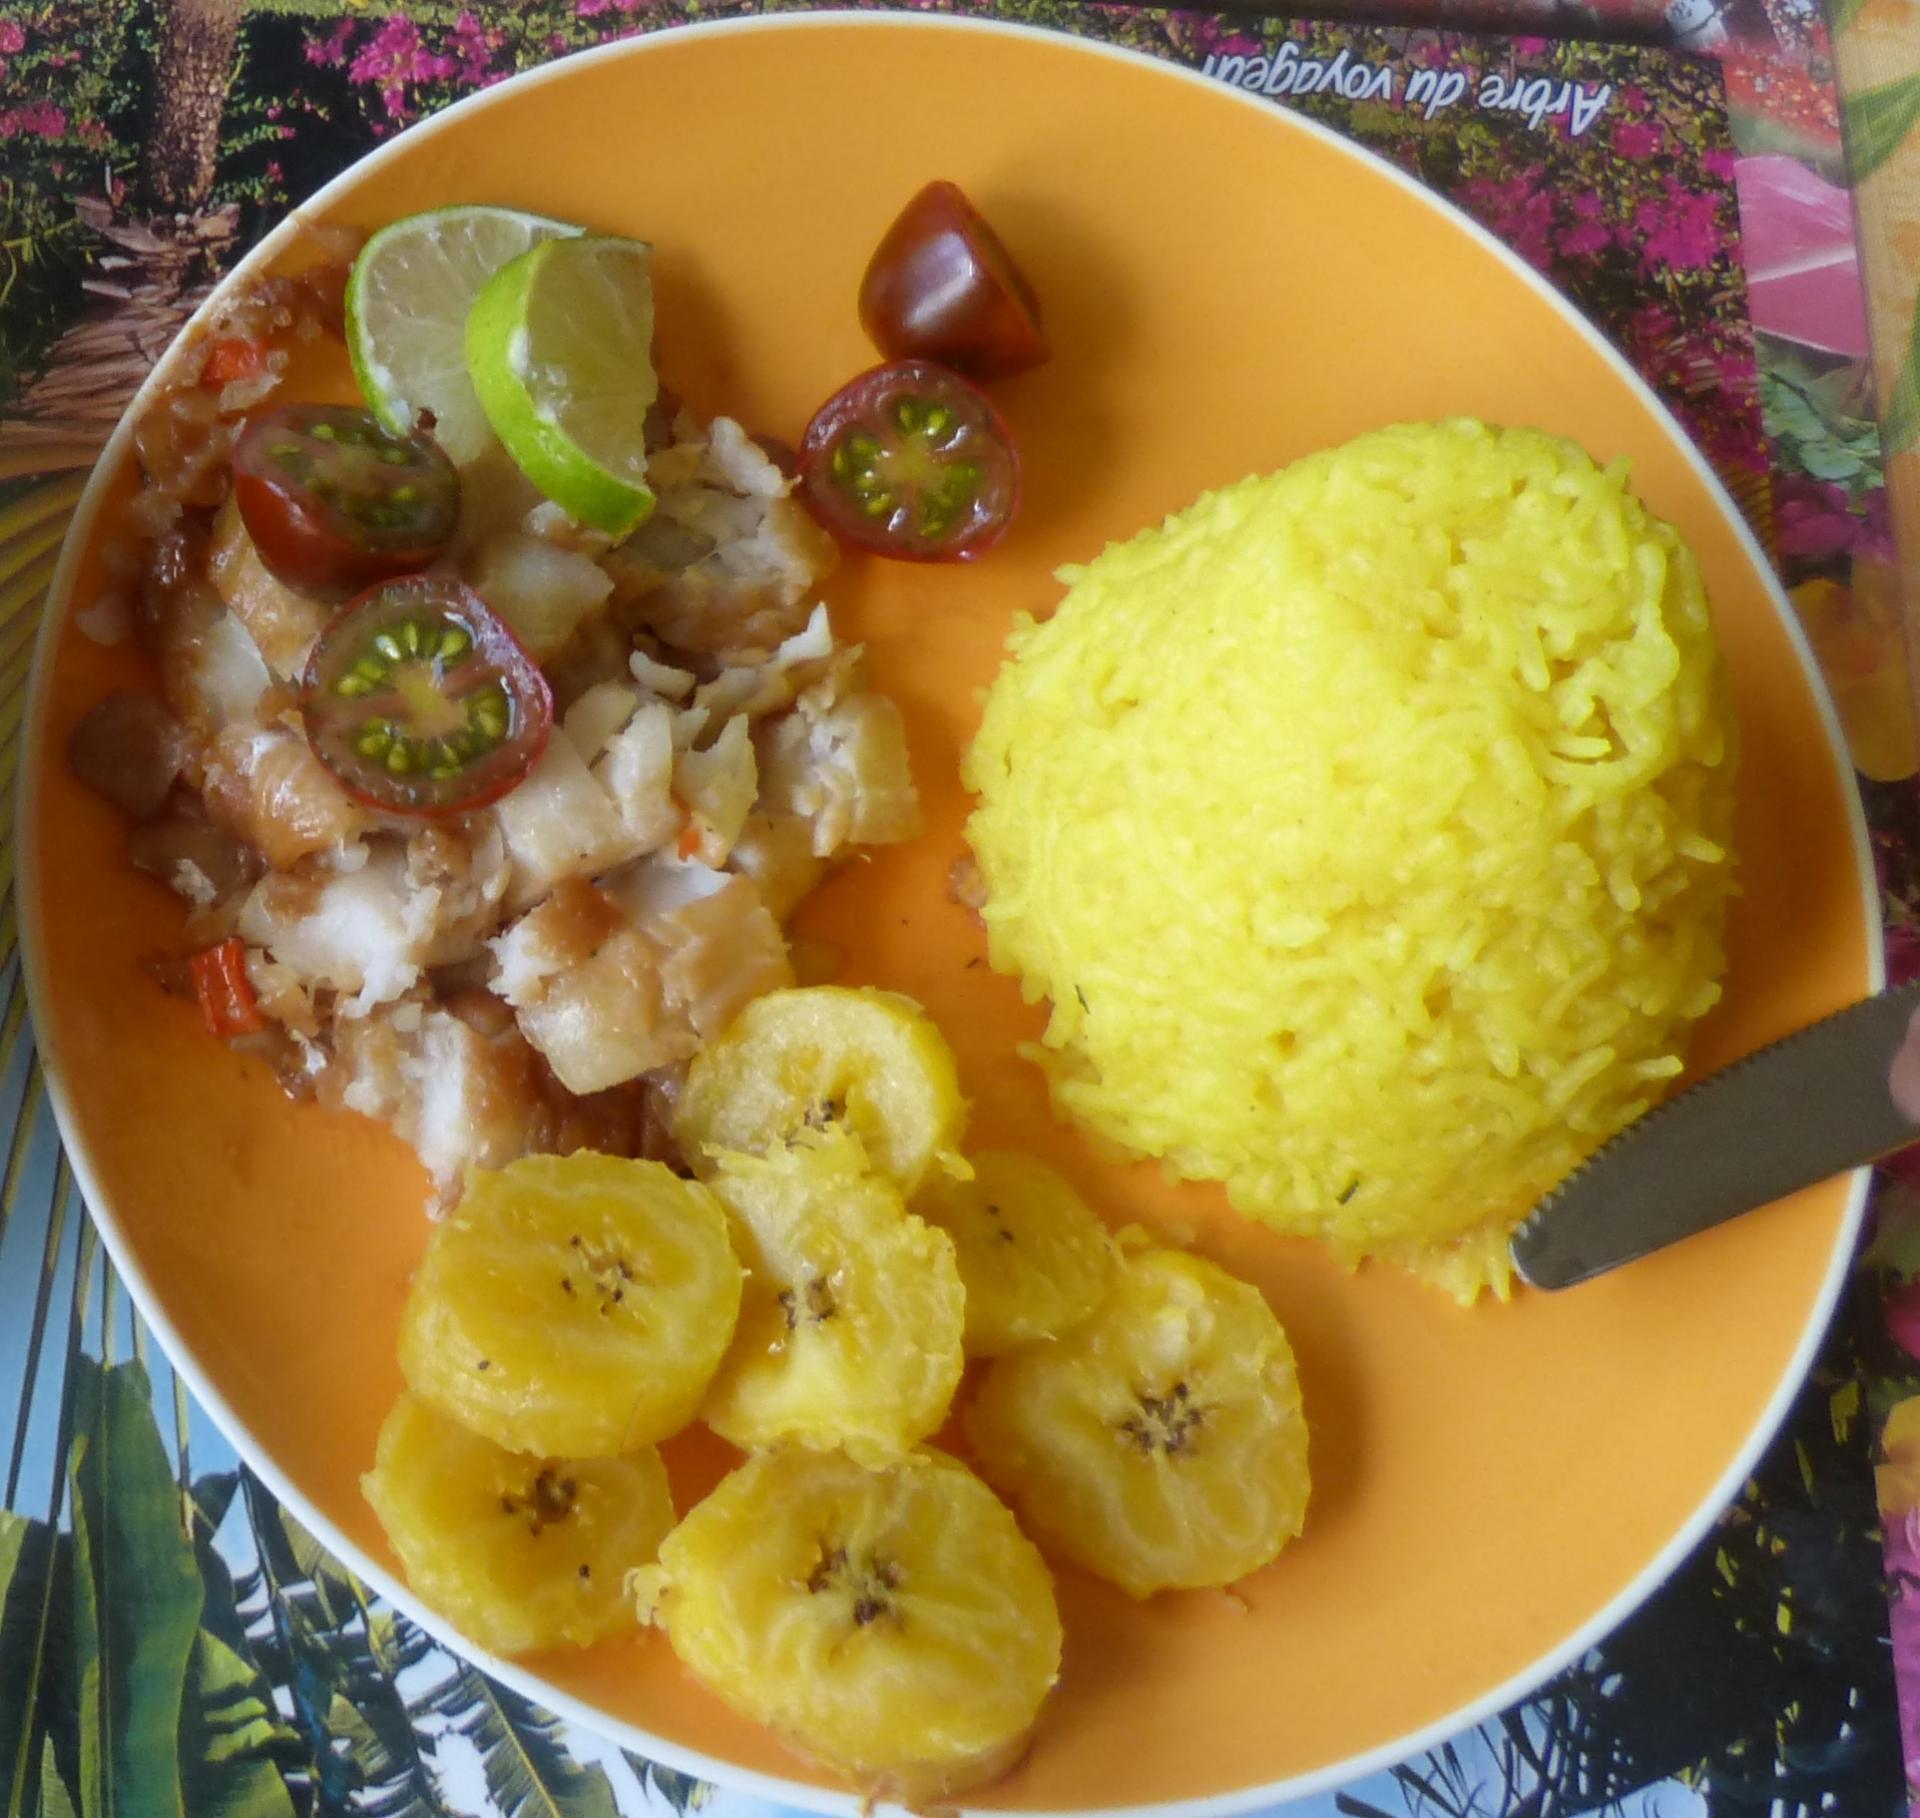 Banane jaune riz safrané et cabillaud